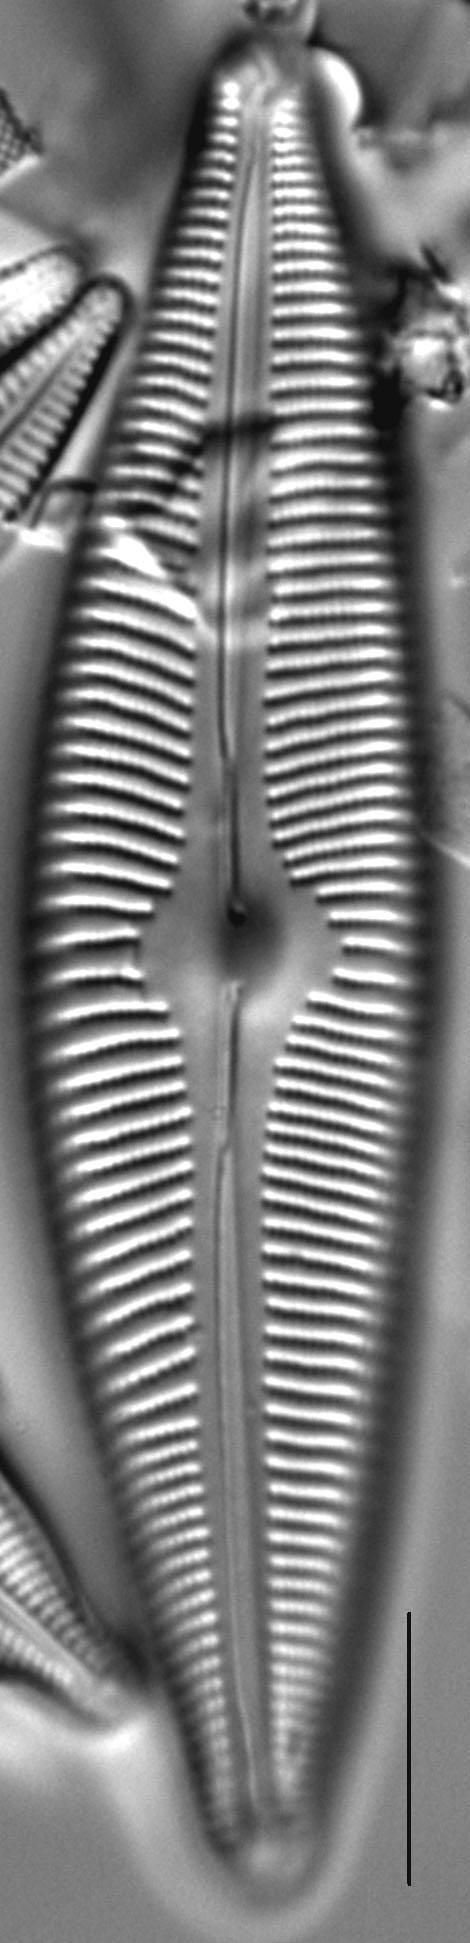 Cymbopleura rainierensis LM1